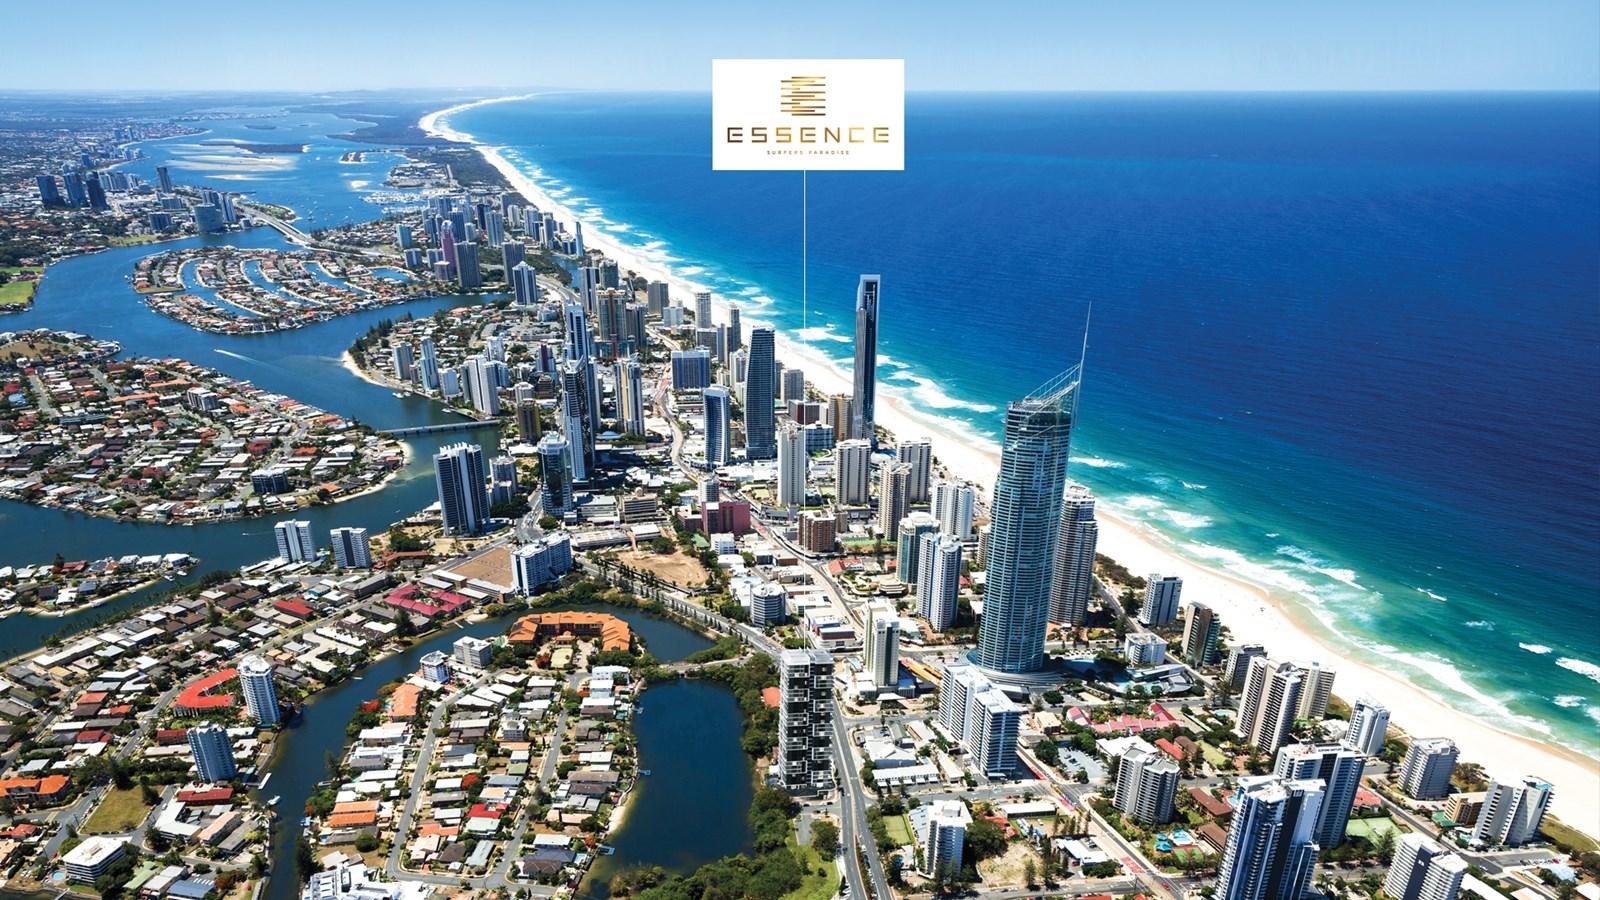 Essence surfers paradise qld for sale domain